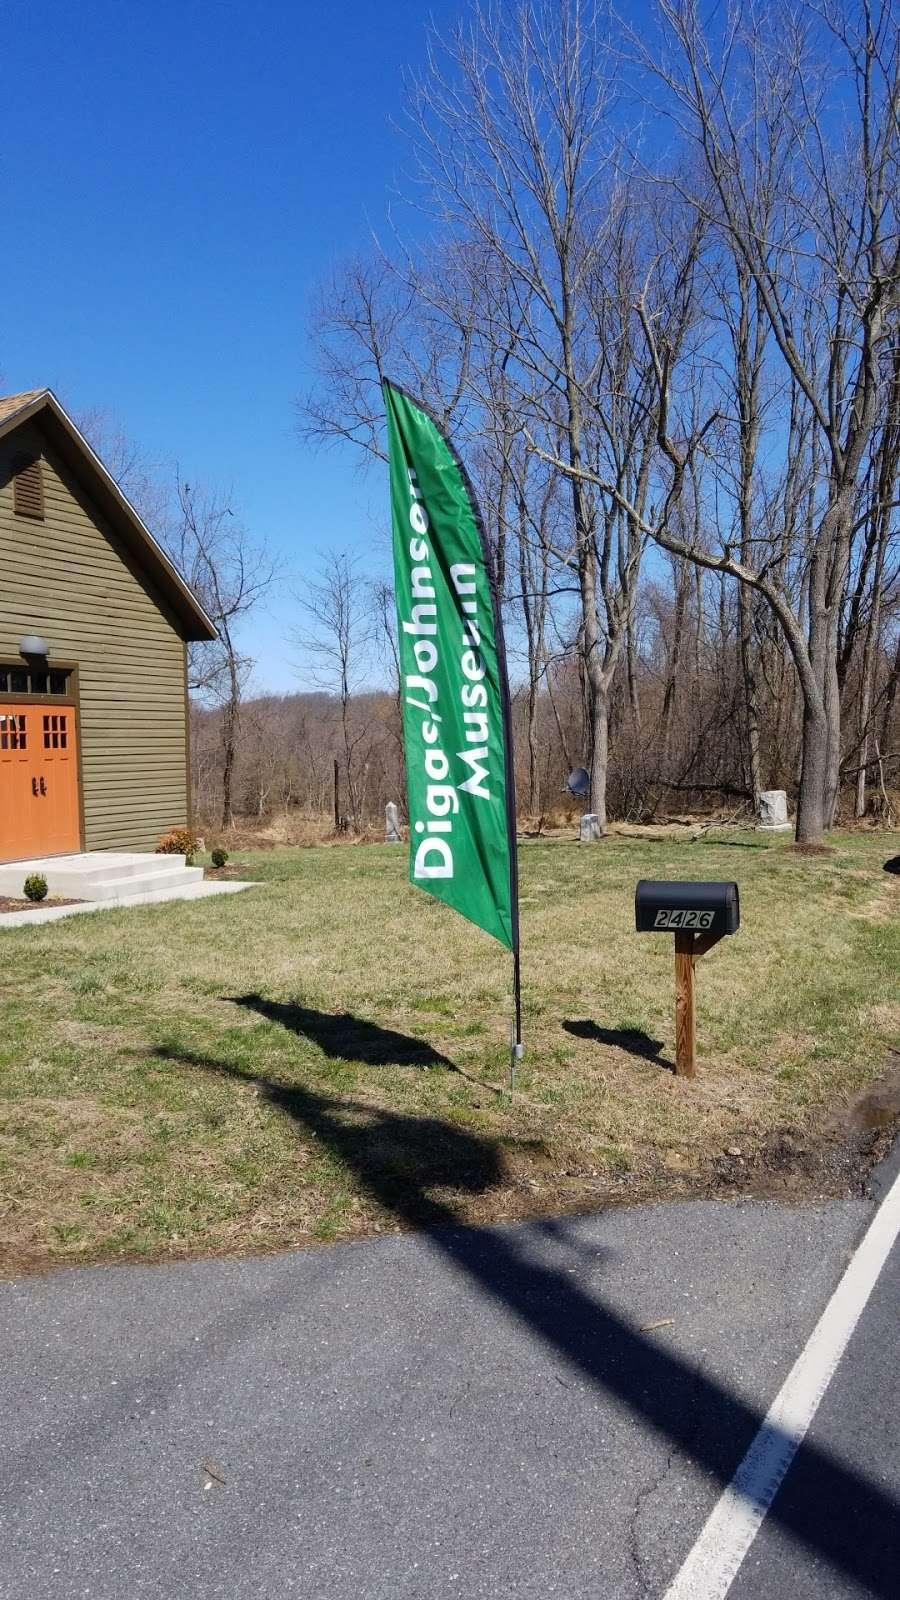 Diggs Johnson Museum - museum  | Photo 2 of 5 | Address: 2426 Offutt Rd, Woodstock, MD 21163, USA | Phone: (443) 675-7282